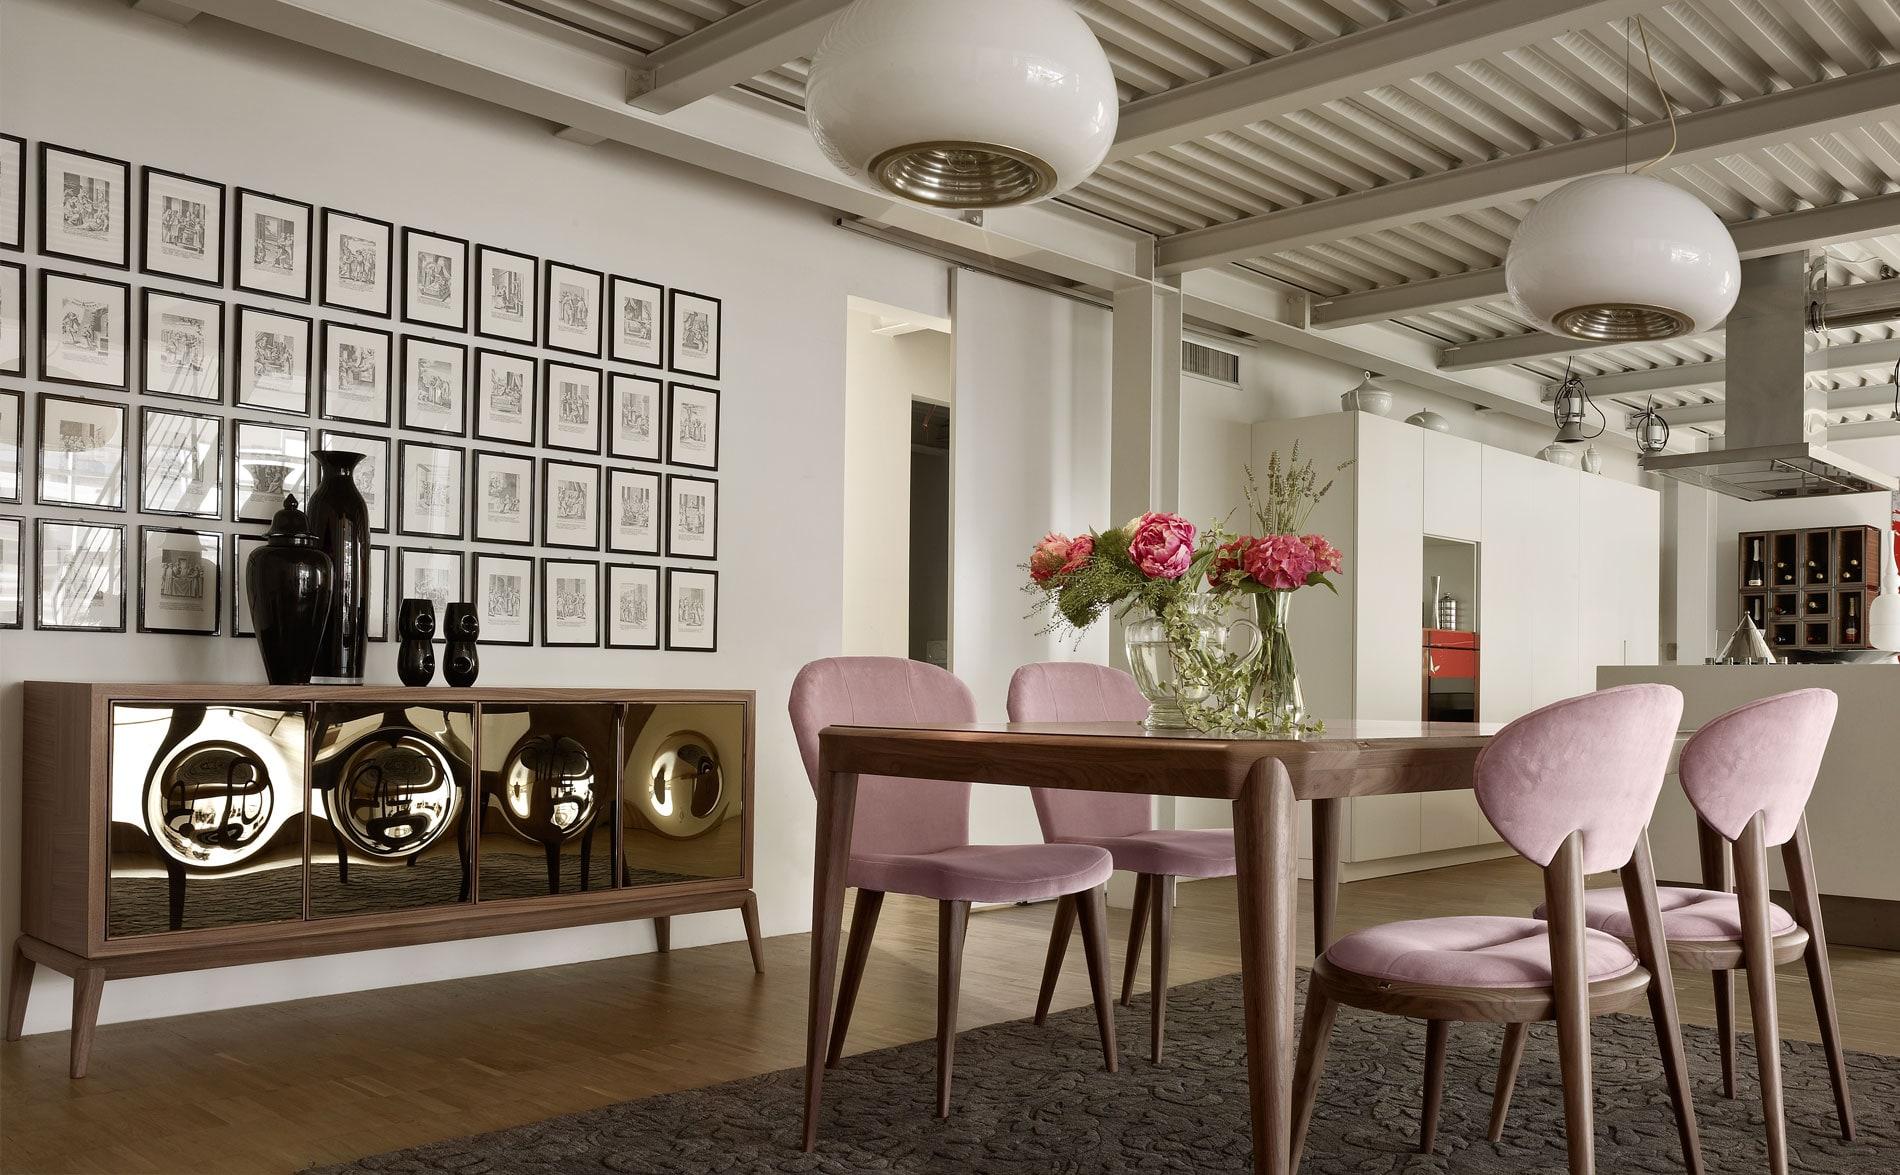 Furniture stieks for Arredamento volpi